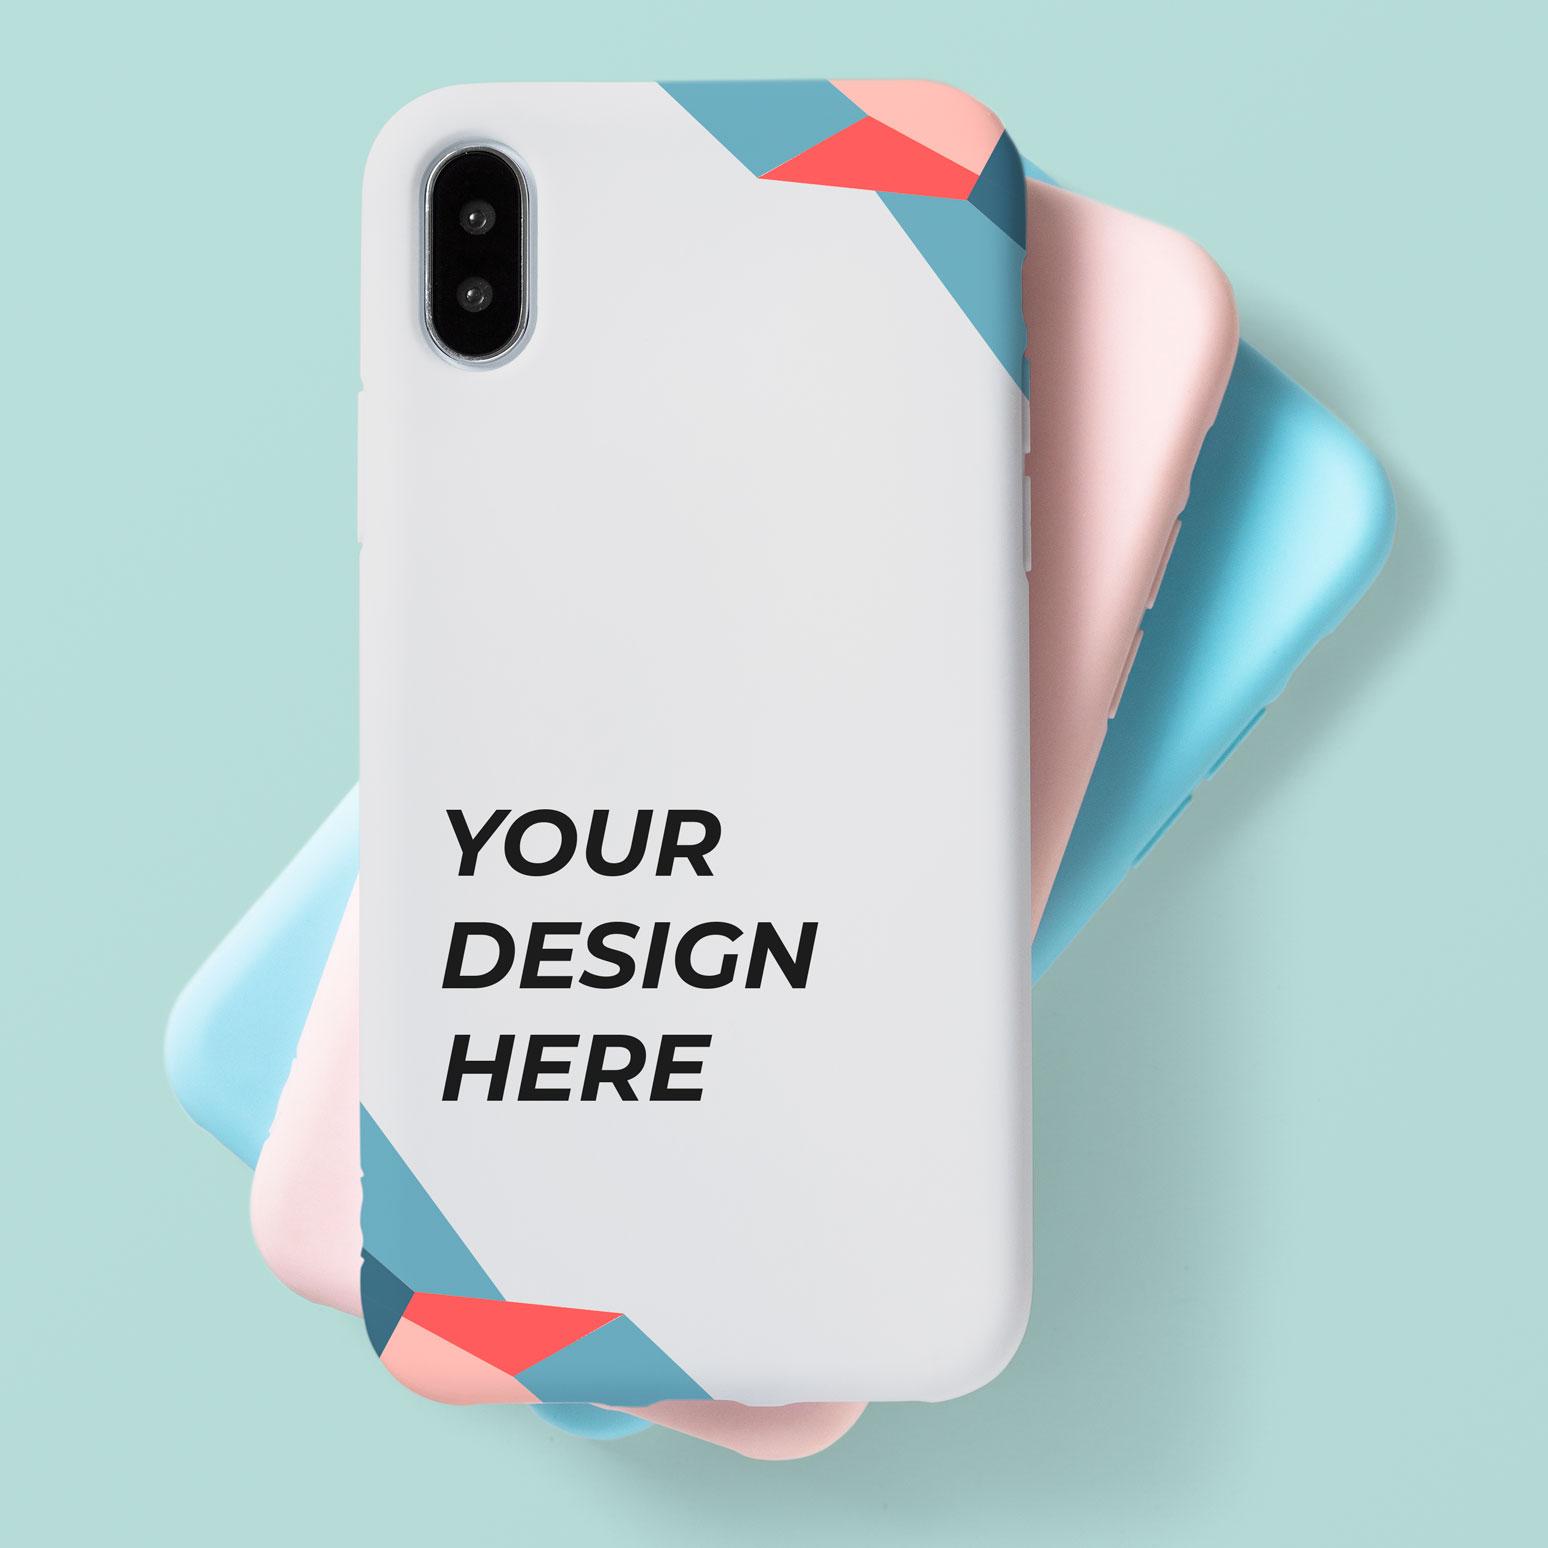 0e8a1f01997330d - 时尚清新手机壳样机